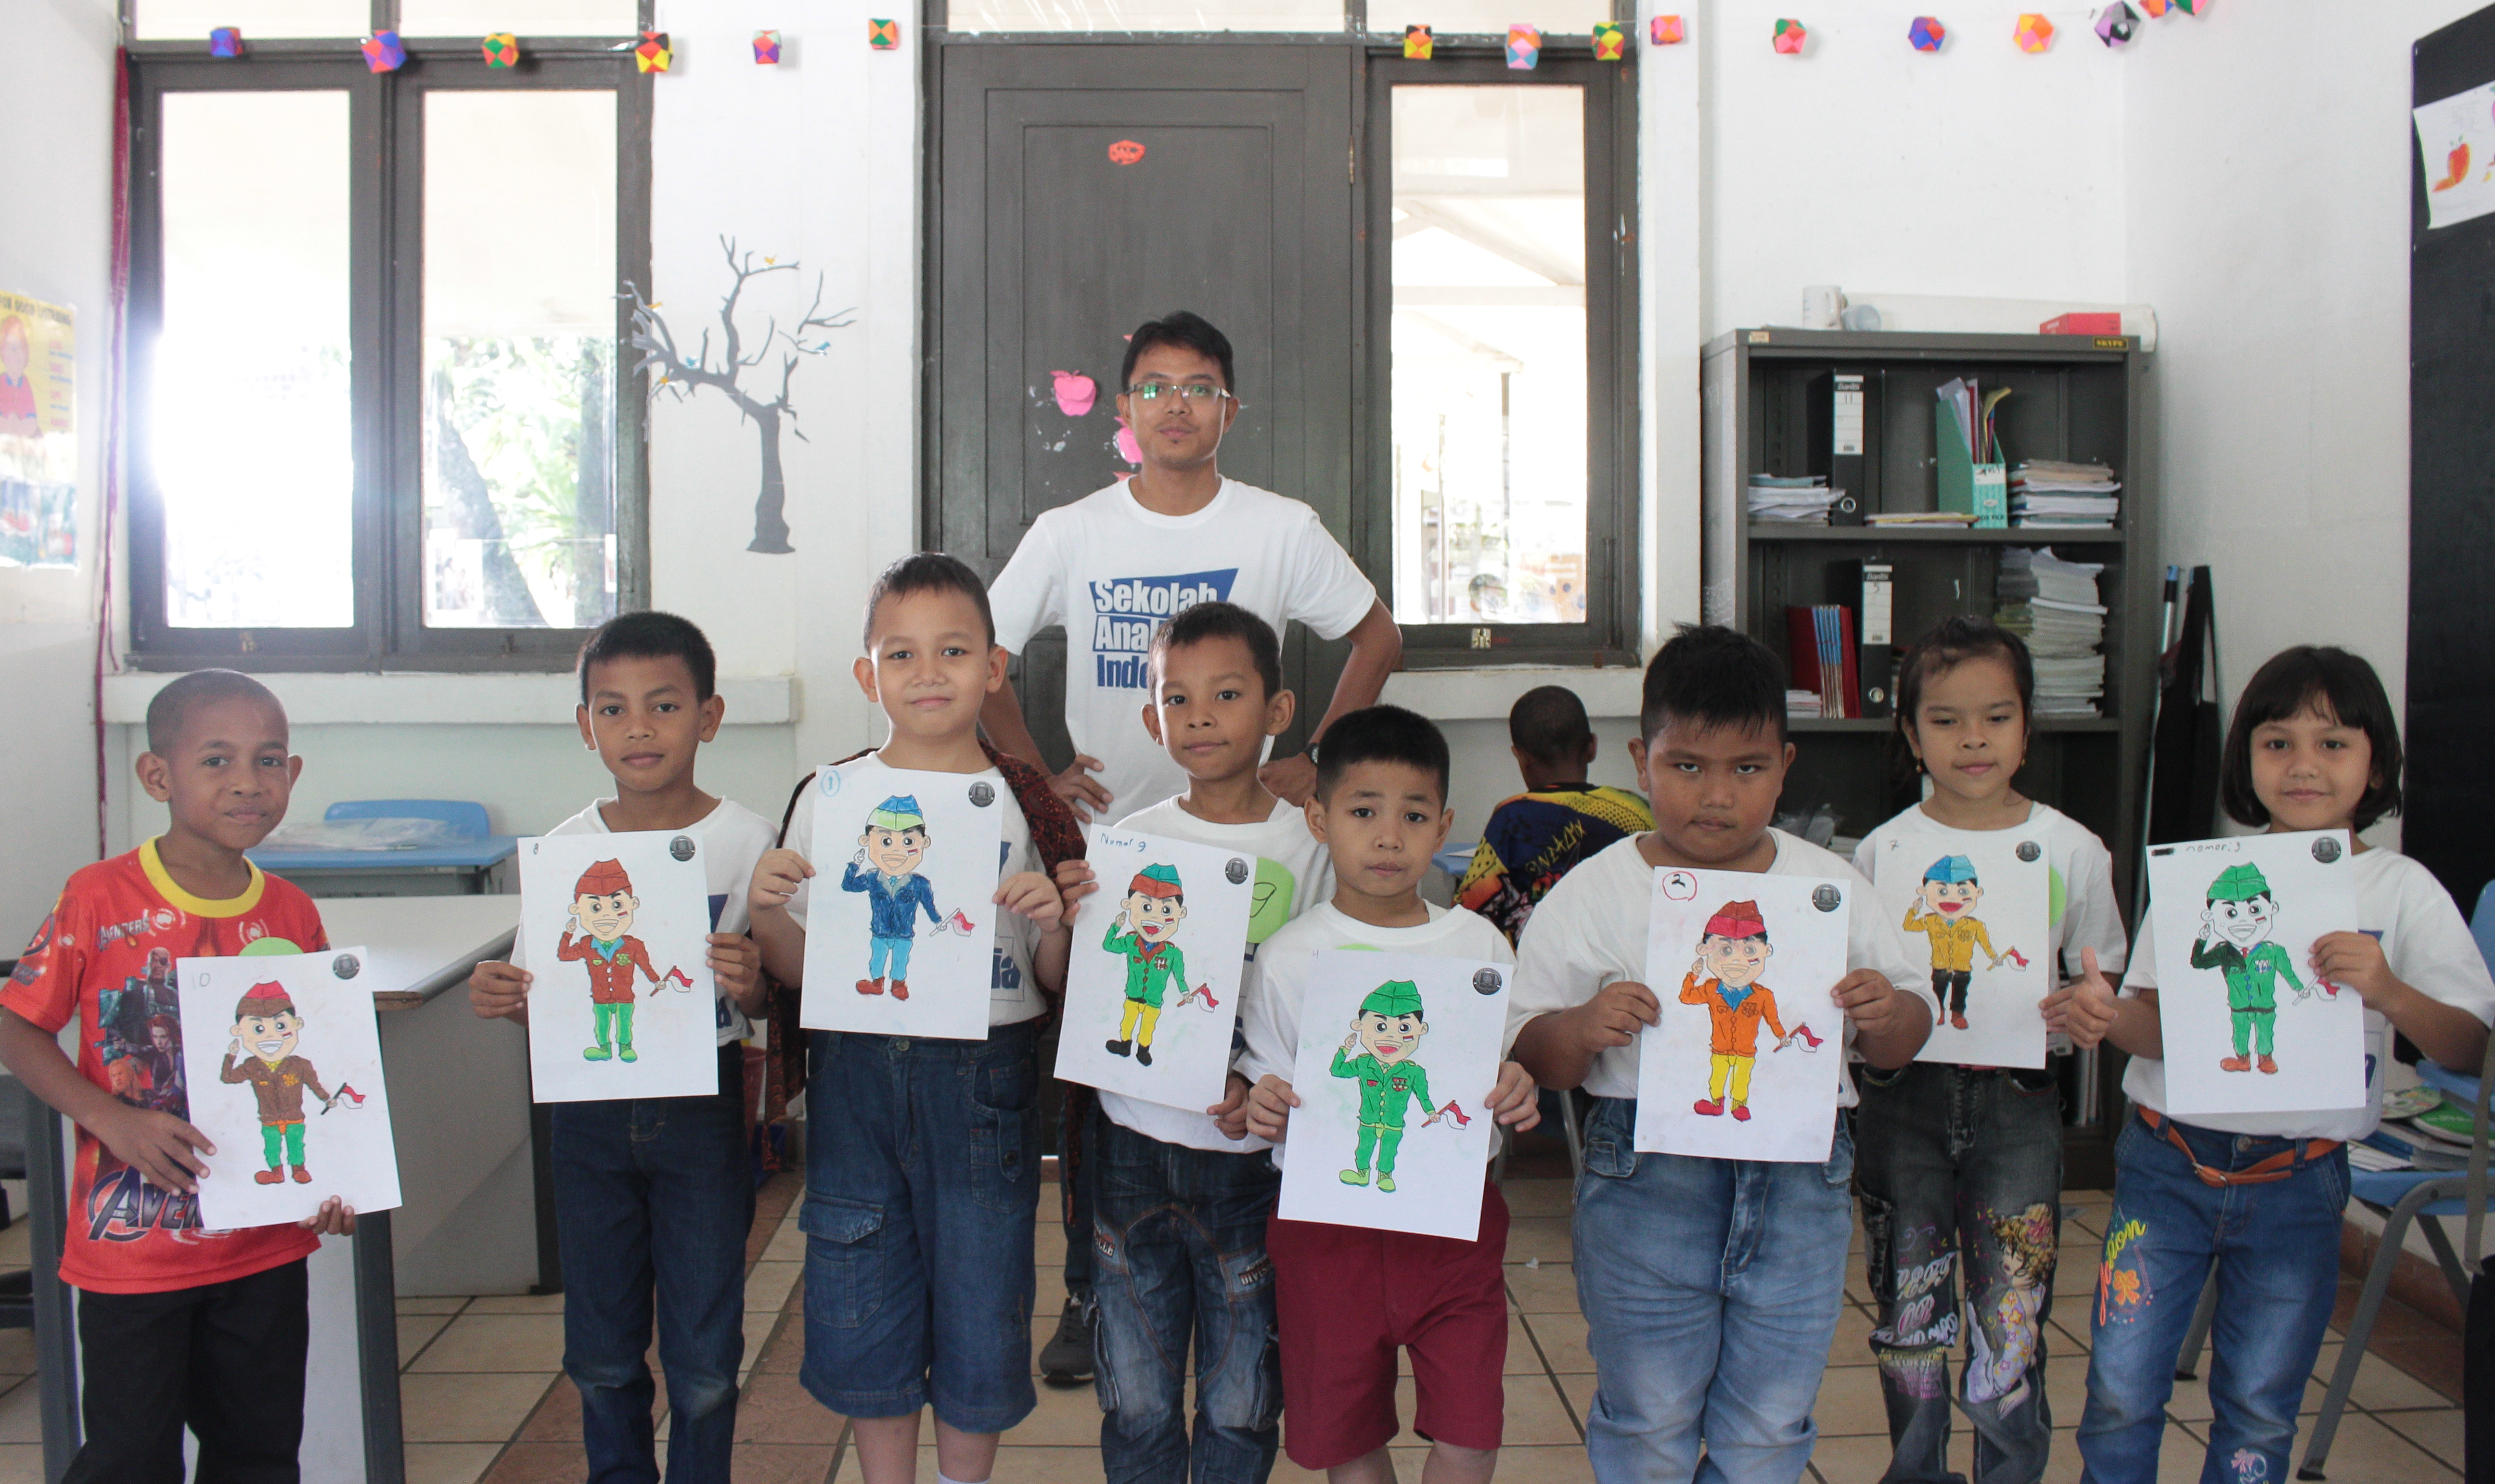 sekolah anak indoensia-sekolah Papua-lomba mewarnai-lomba menggambar_ sekolah papua di sentul-sekolah anak papua